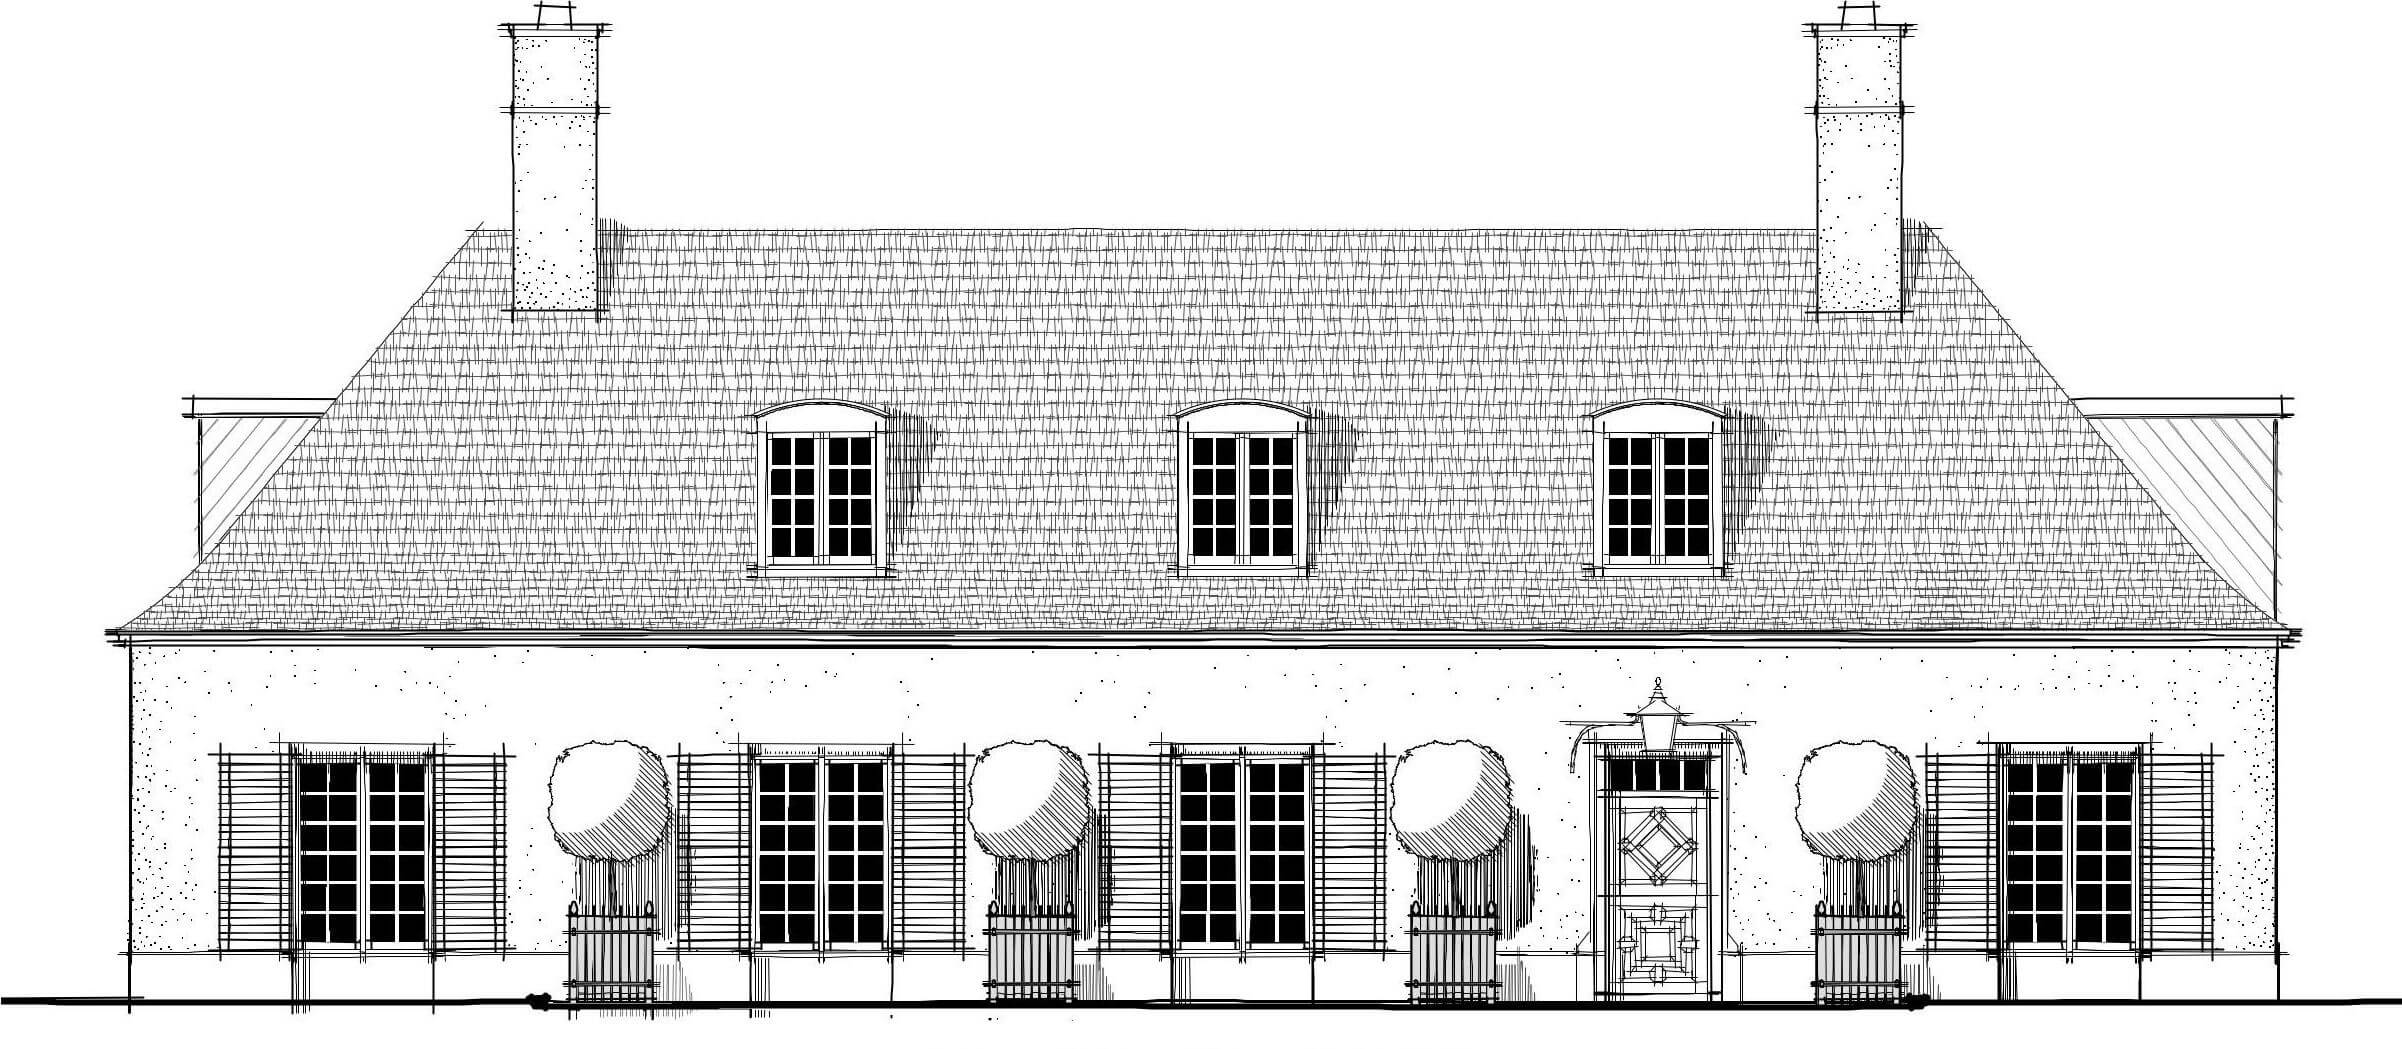 1 LANTERNE HOUSE FORECOURT ELEV WEBSITE 2018.jpg